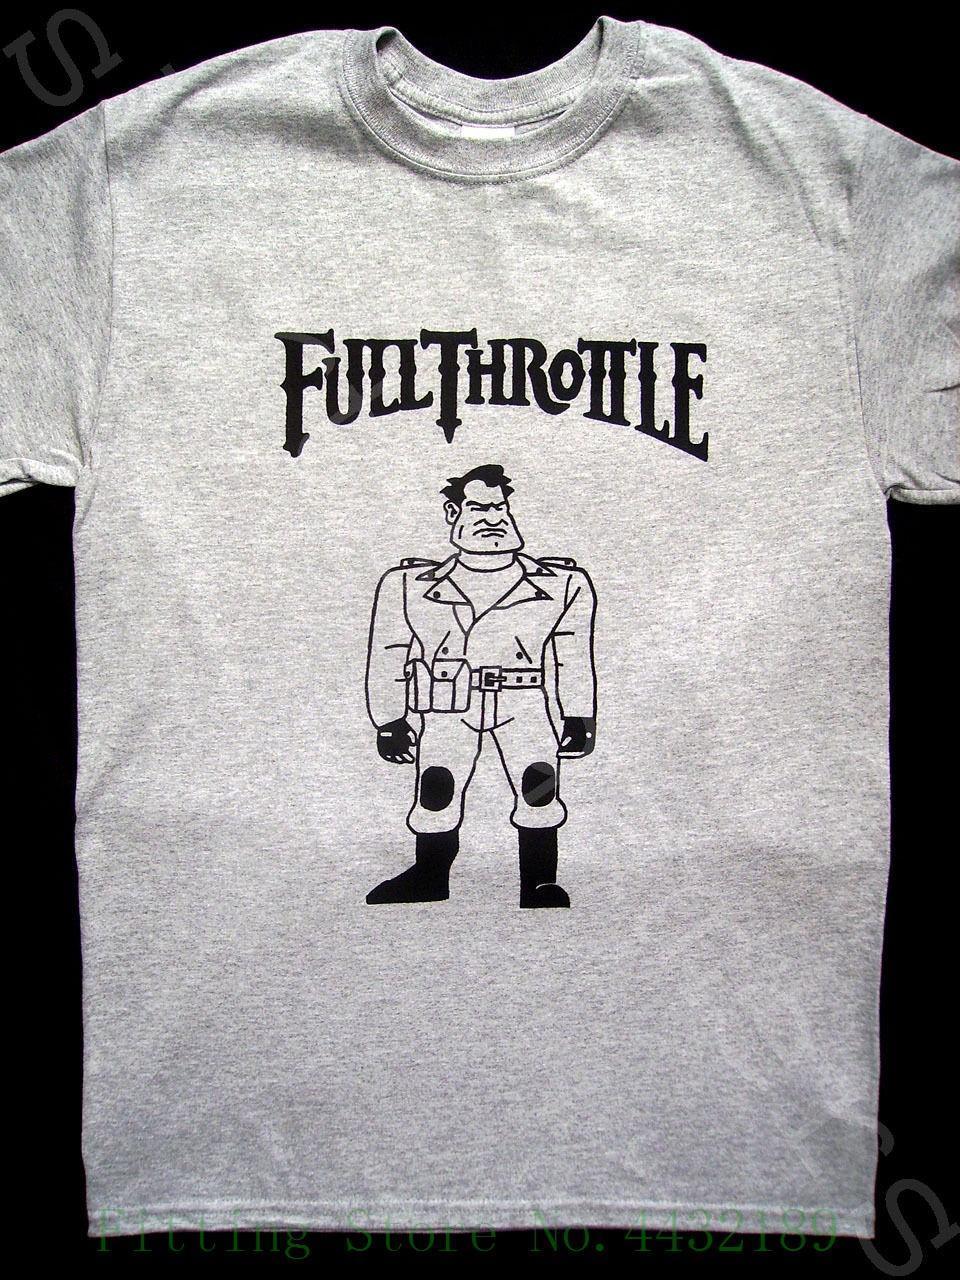 fabb6562d Full Throttle T Shirt Maniac Mansion Loom Lucasarts Grim Fandango Day  Tentacle T Shirt Short Sleeve Brand Make T Shirts Online Tees Design From  Yubin07, ...